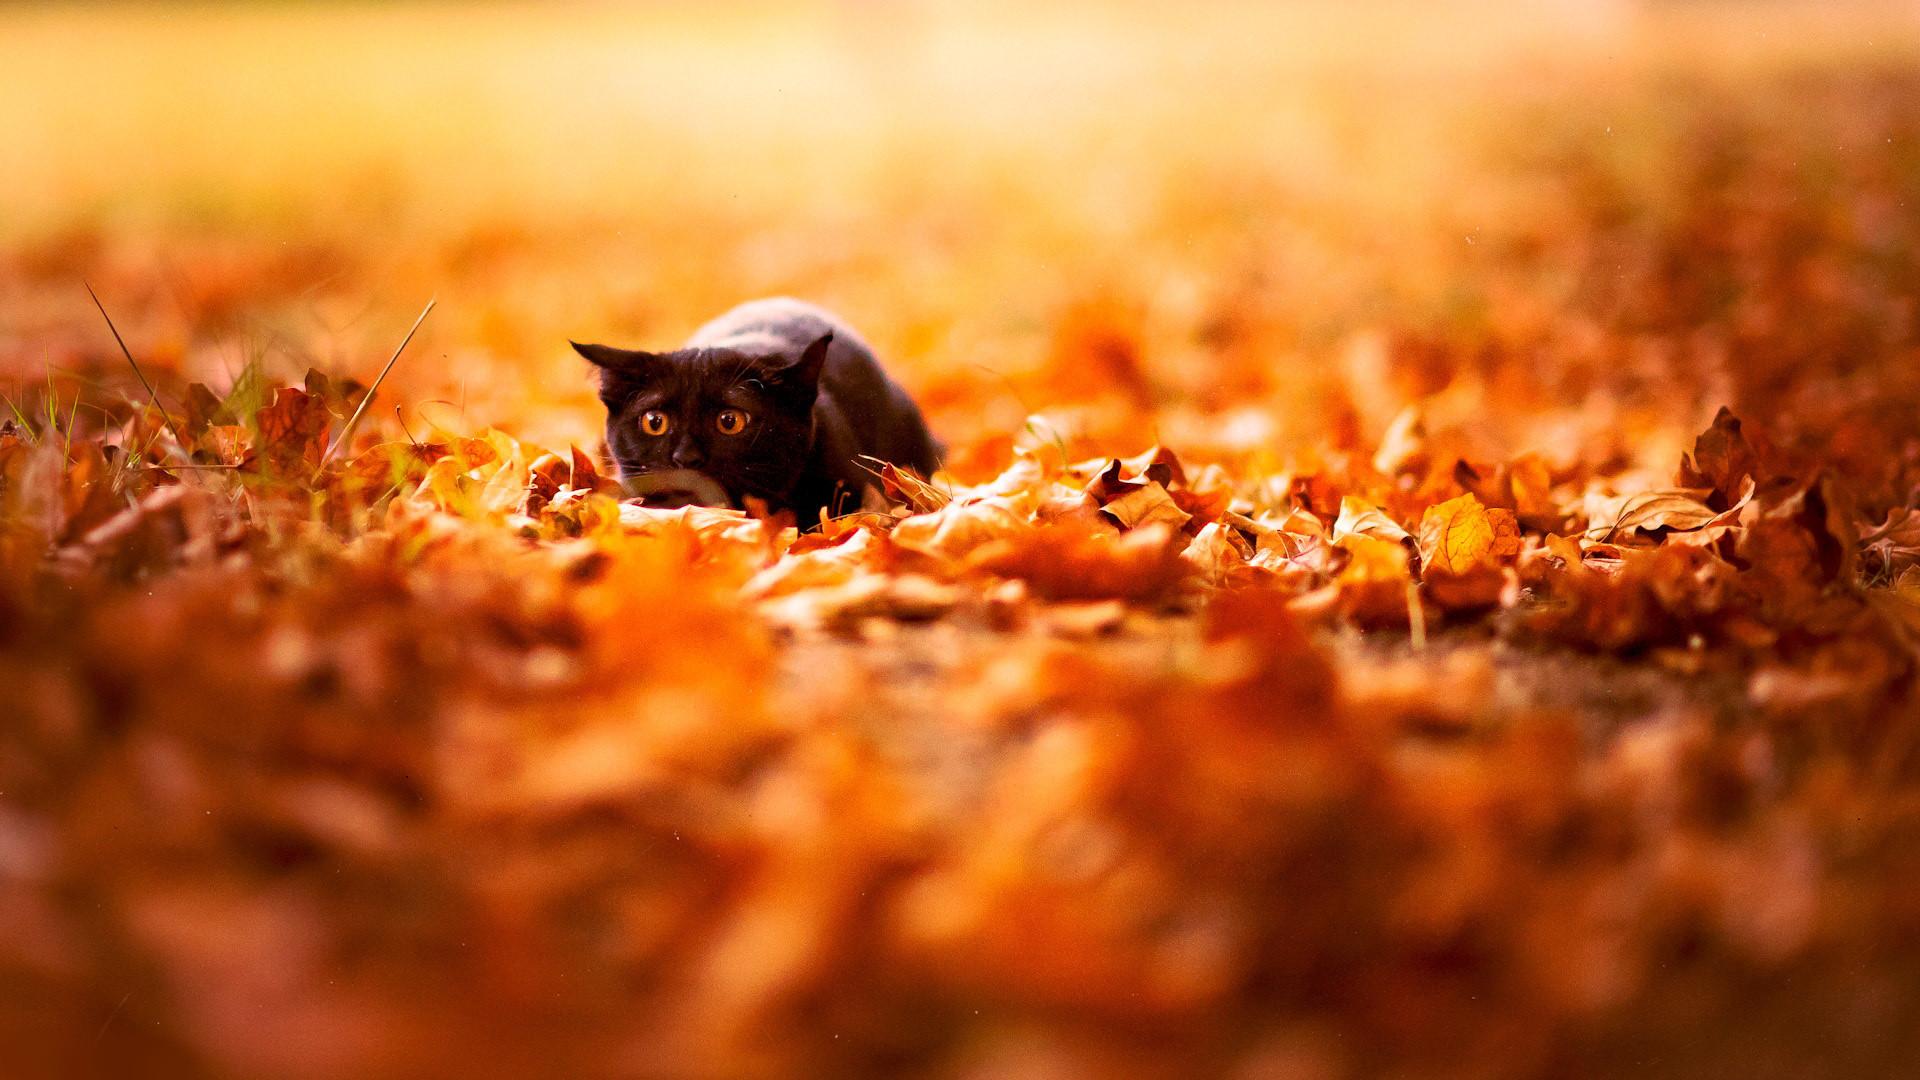 Autumn Leaves Desktop Wallpaper, wallpaper, Autumn Leaves Desktop .